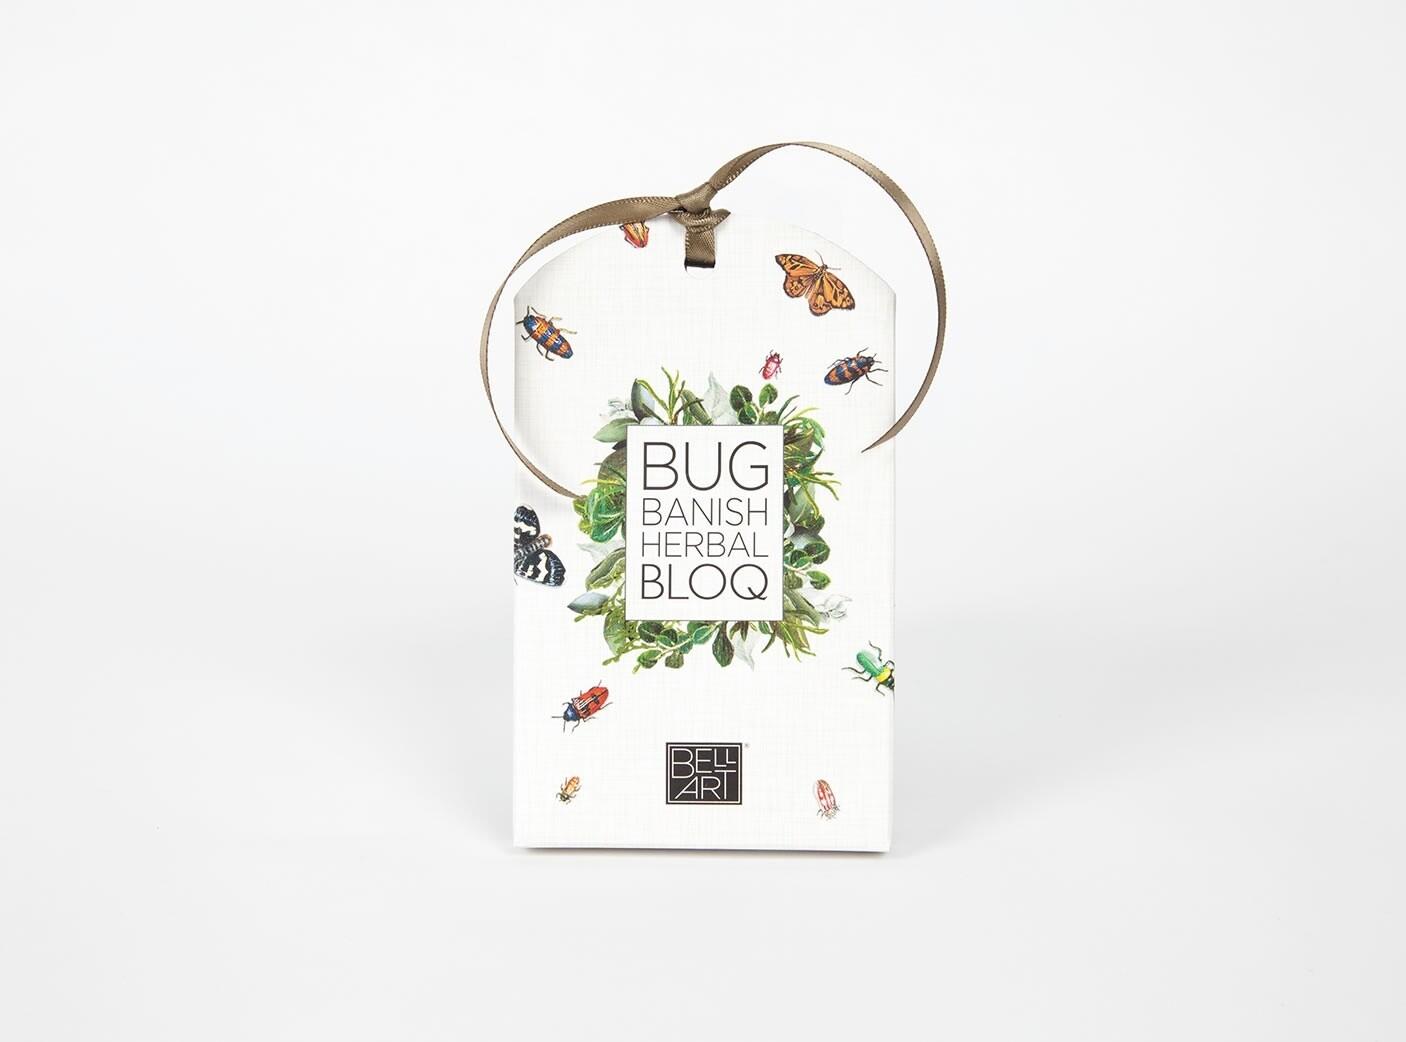 BELL ART - Herbal Bloq - Bug Banish